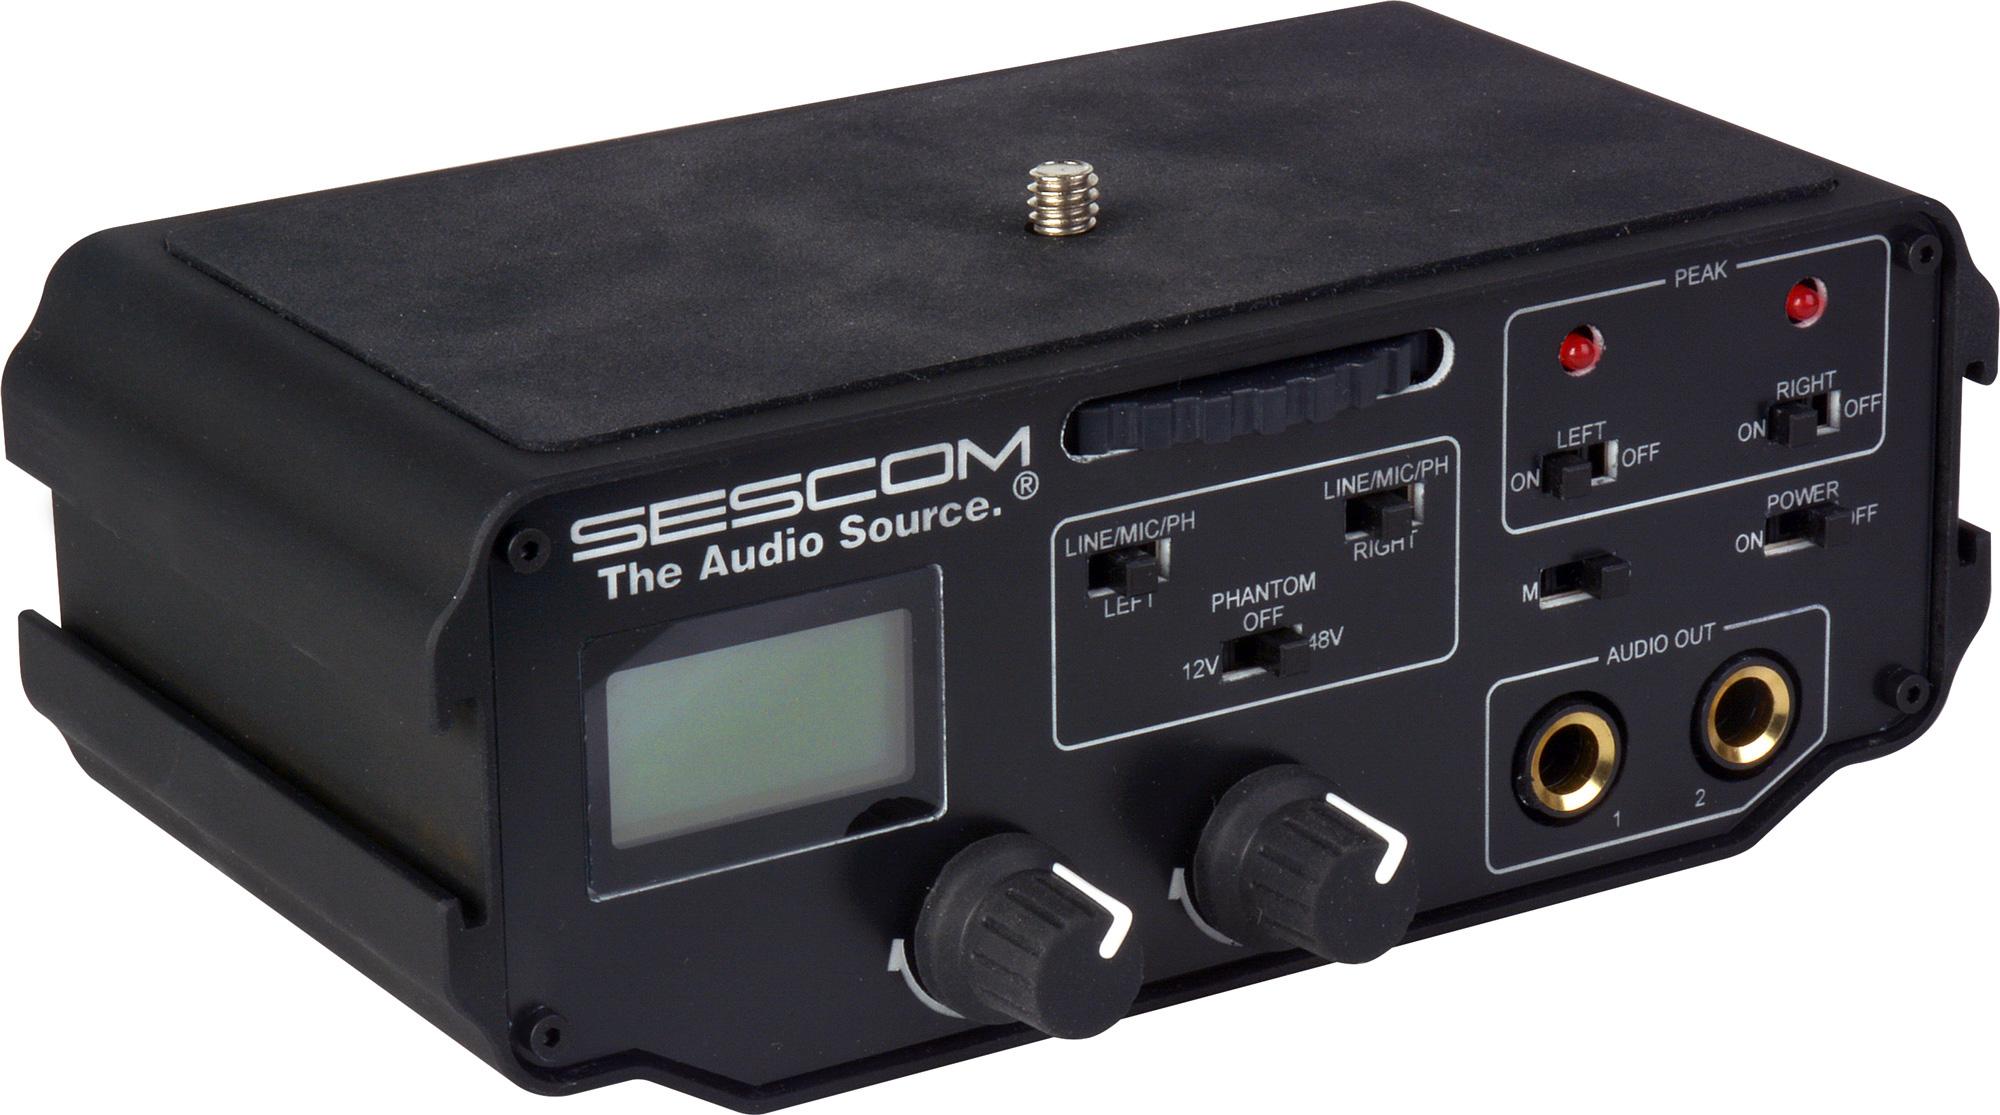 sescom bmcc mix1 2 channel xlr audio mixer with level meter peak controls phantom power for. Black Bedroom Furniture Sets. Home Design Ideas